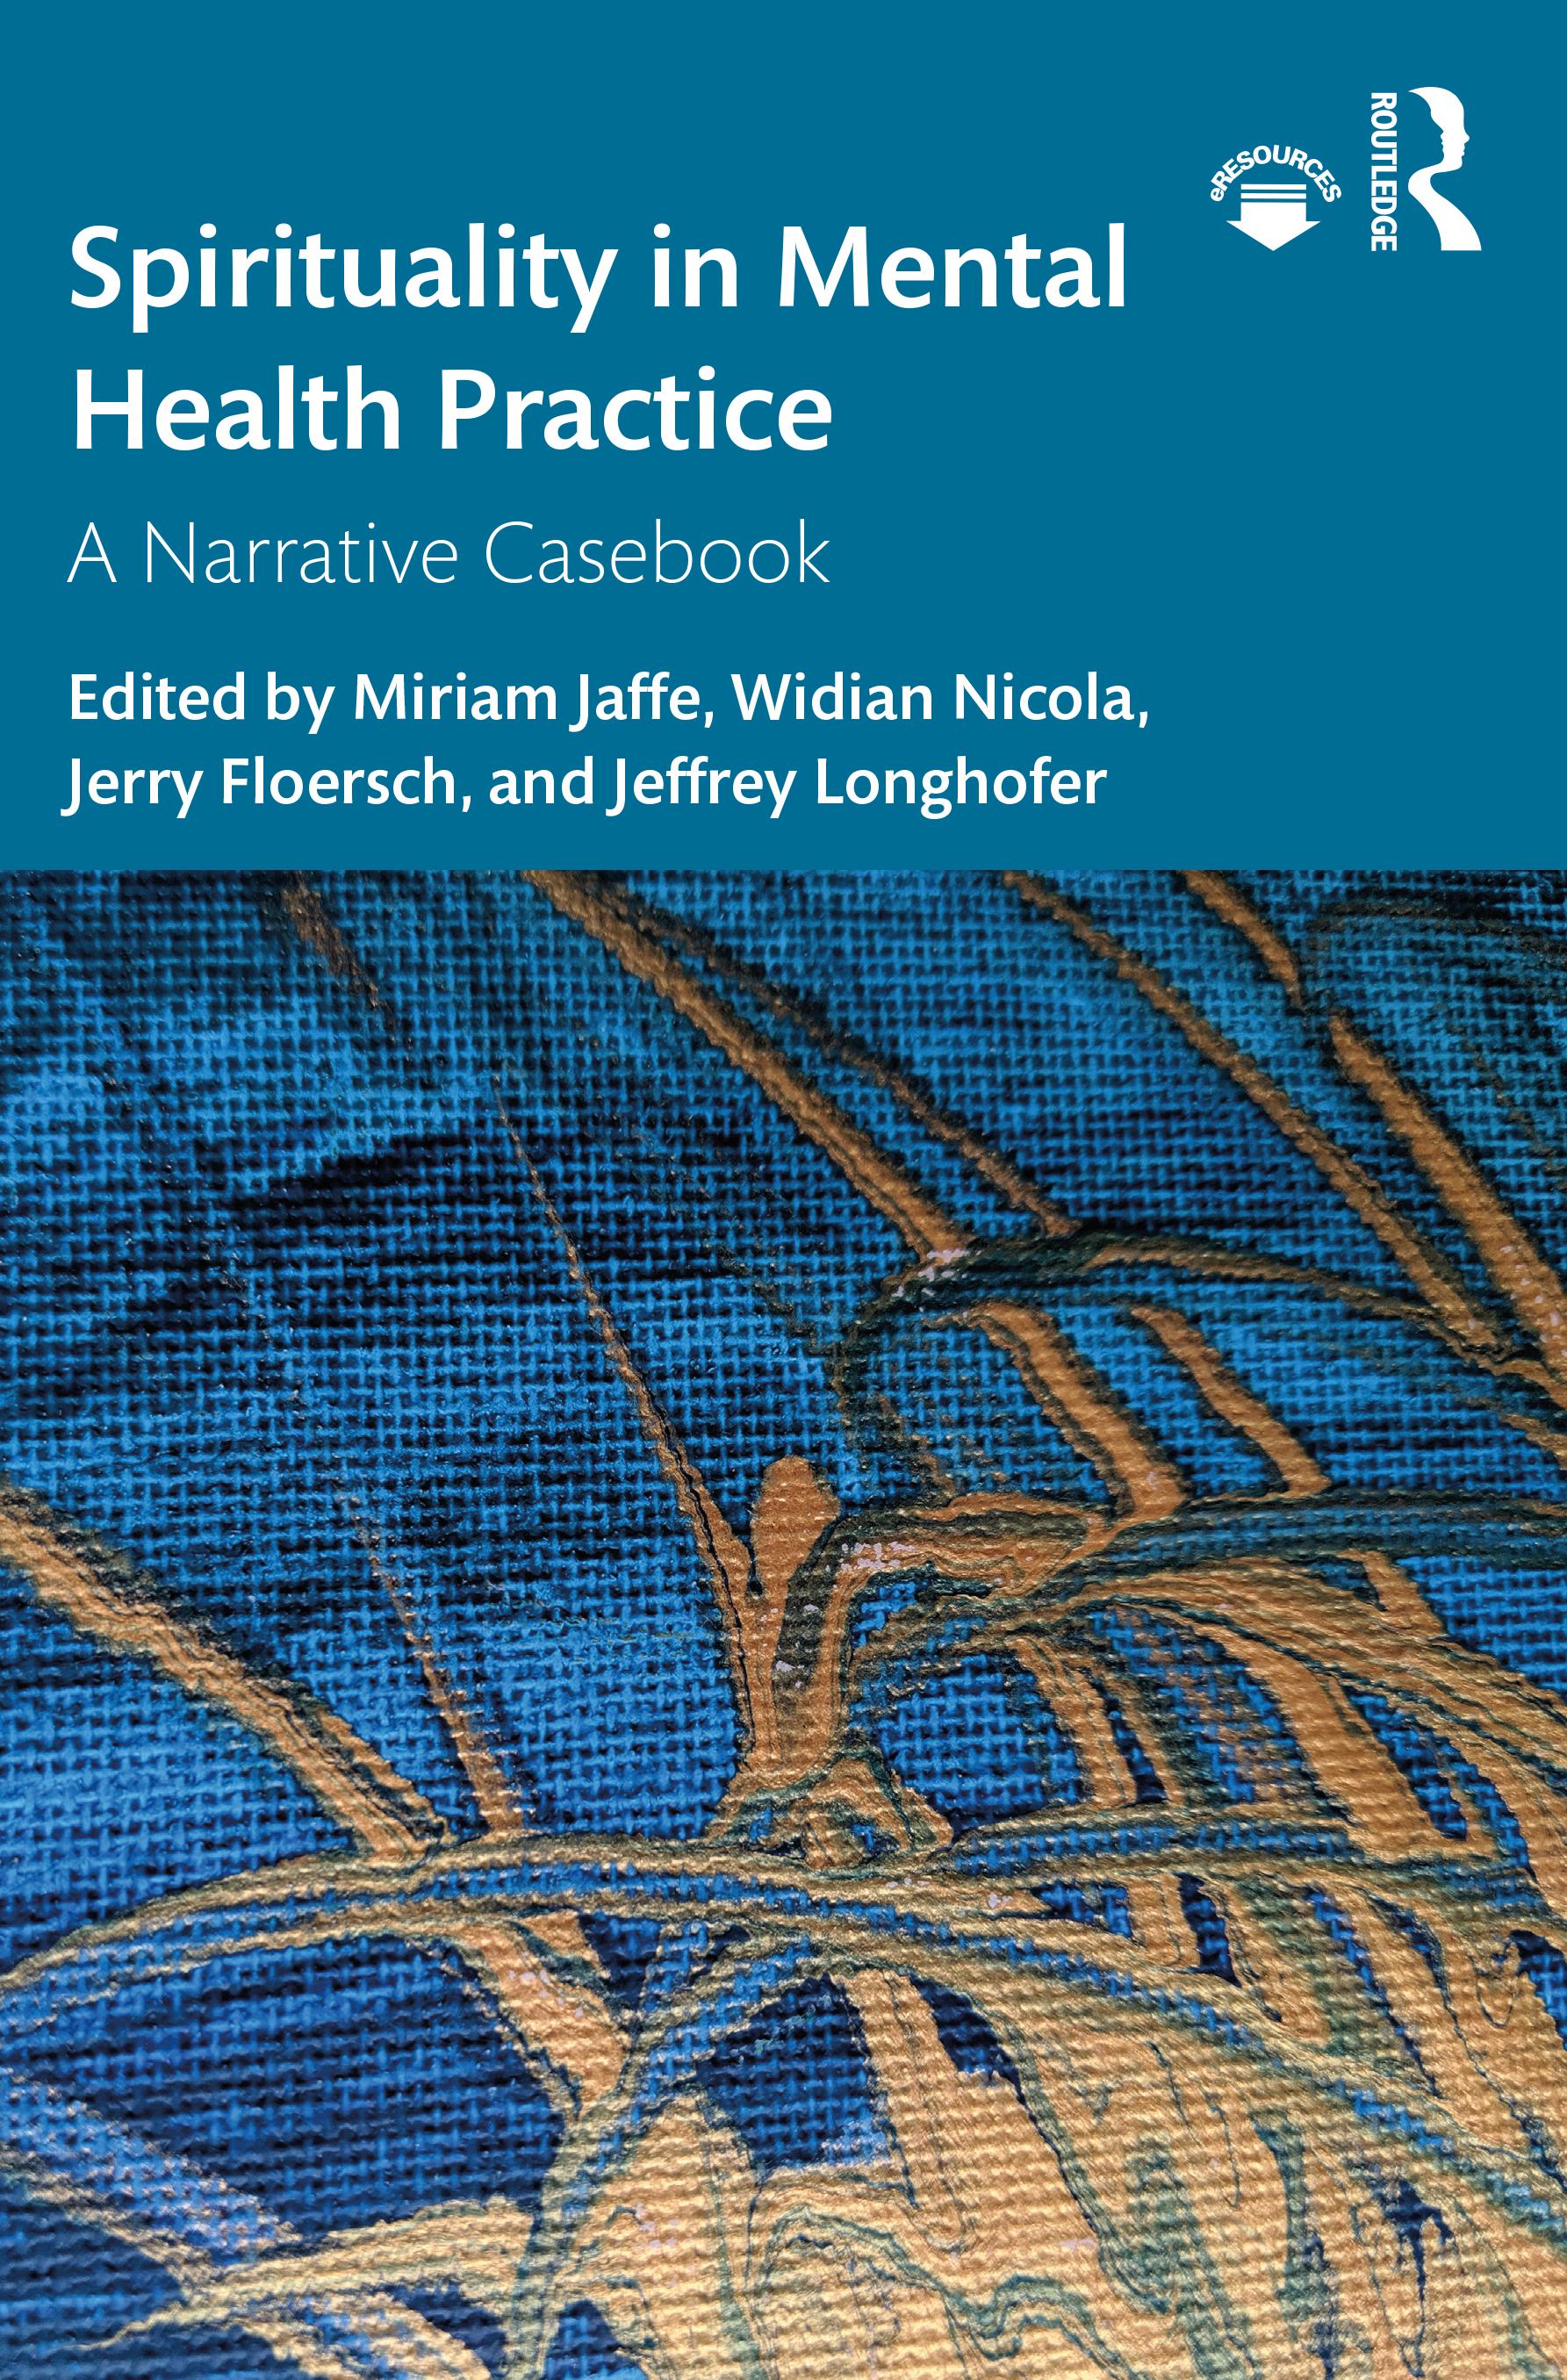 Spirituality in Mental Health Practice: A Narrative Casebook book cover